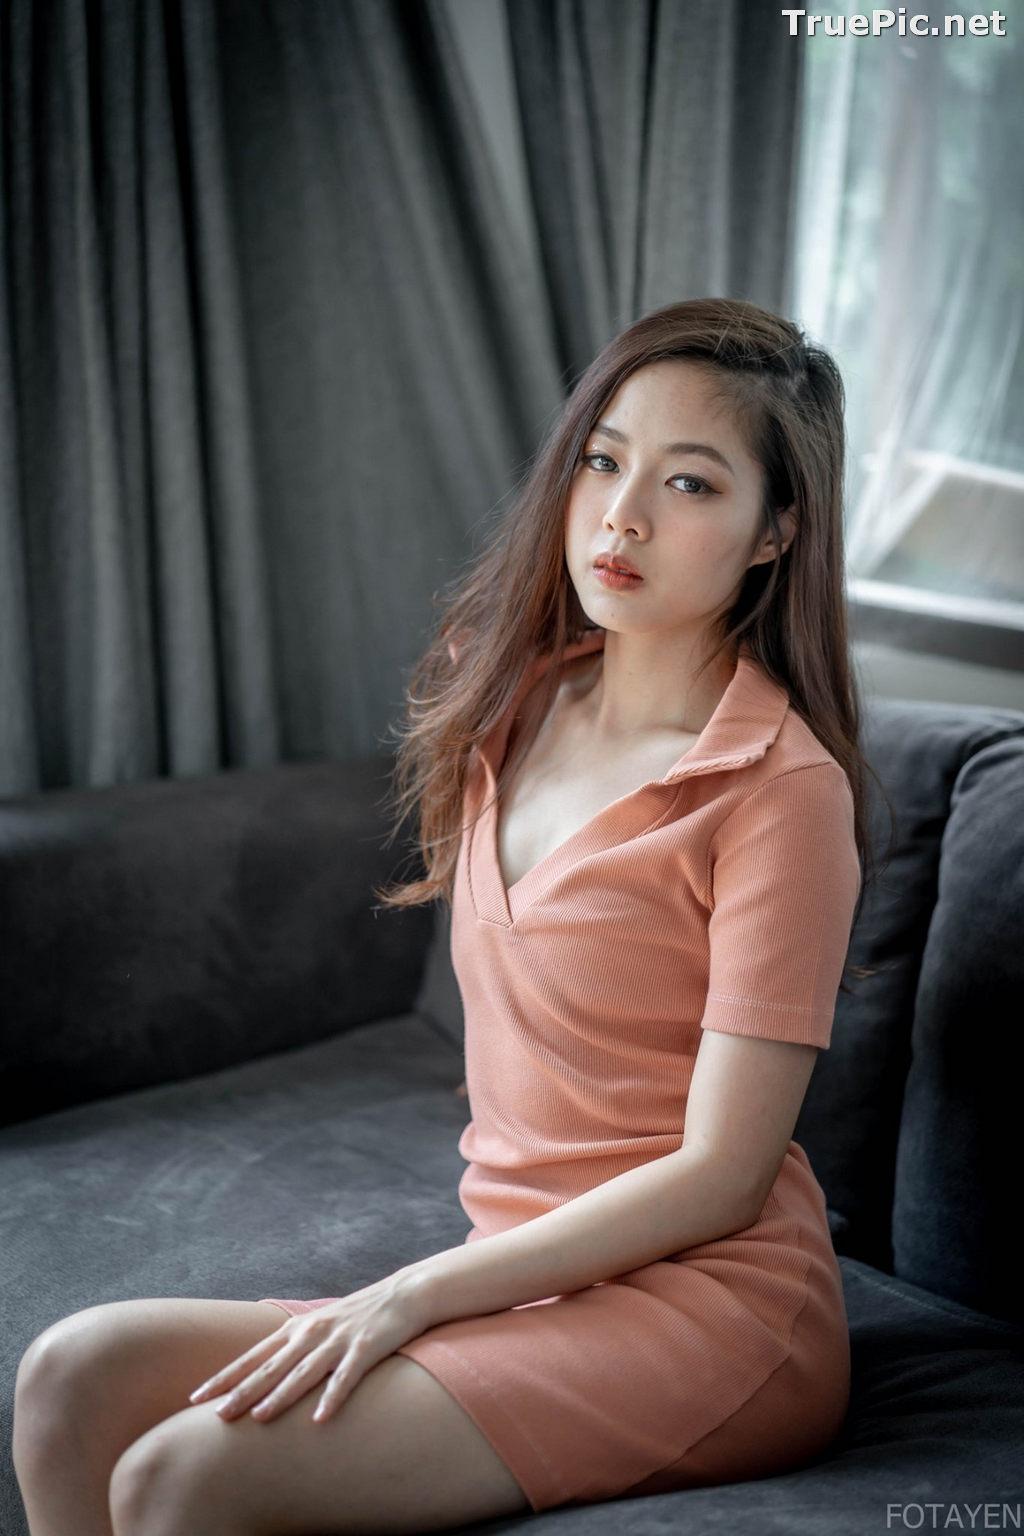 Image Thailand Model - Chanitar Sophawatanon - Pink Lady - TruePic.net - Picture-2